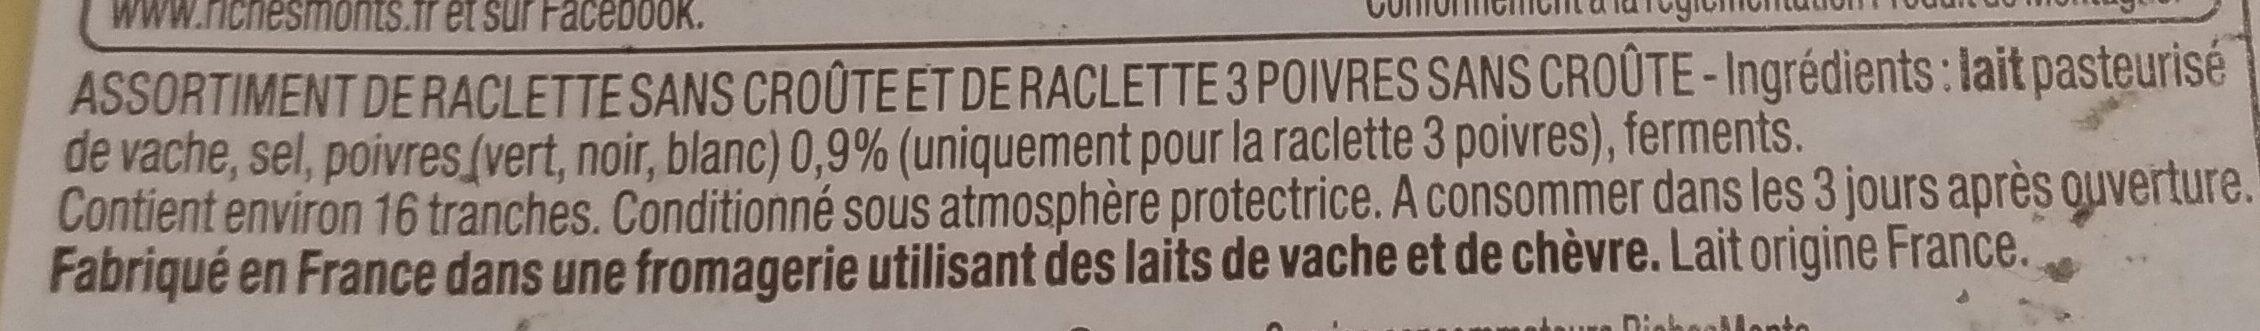 Duo raclette - Ingrédients - fr